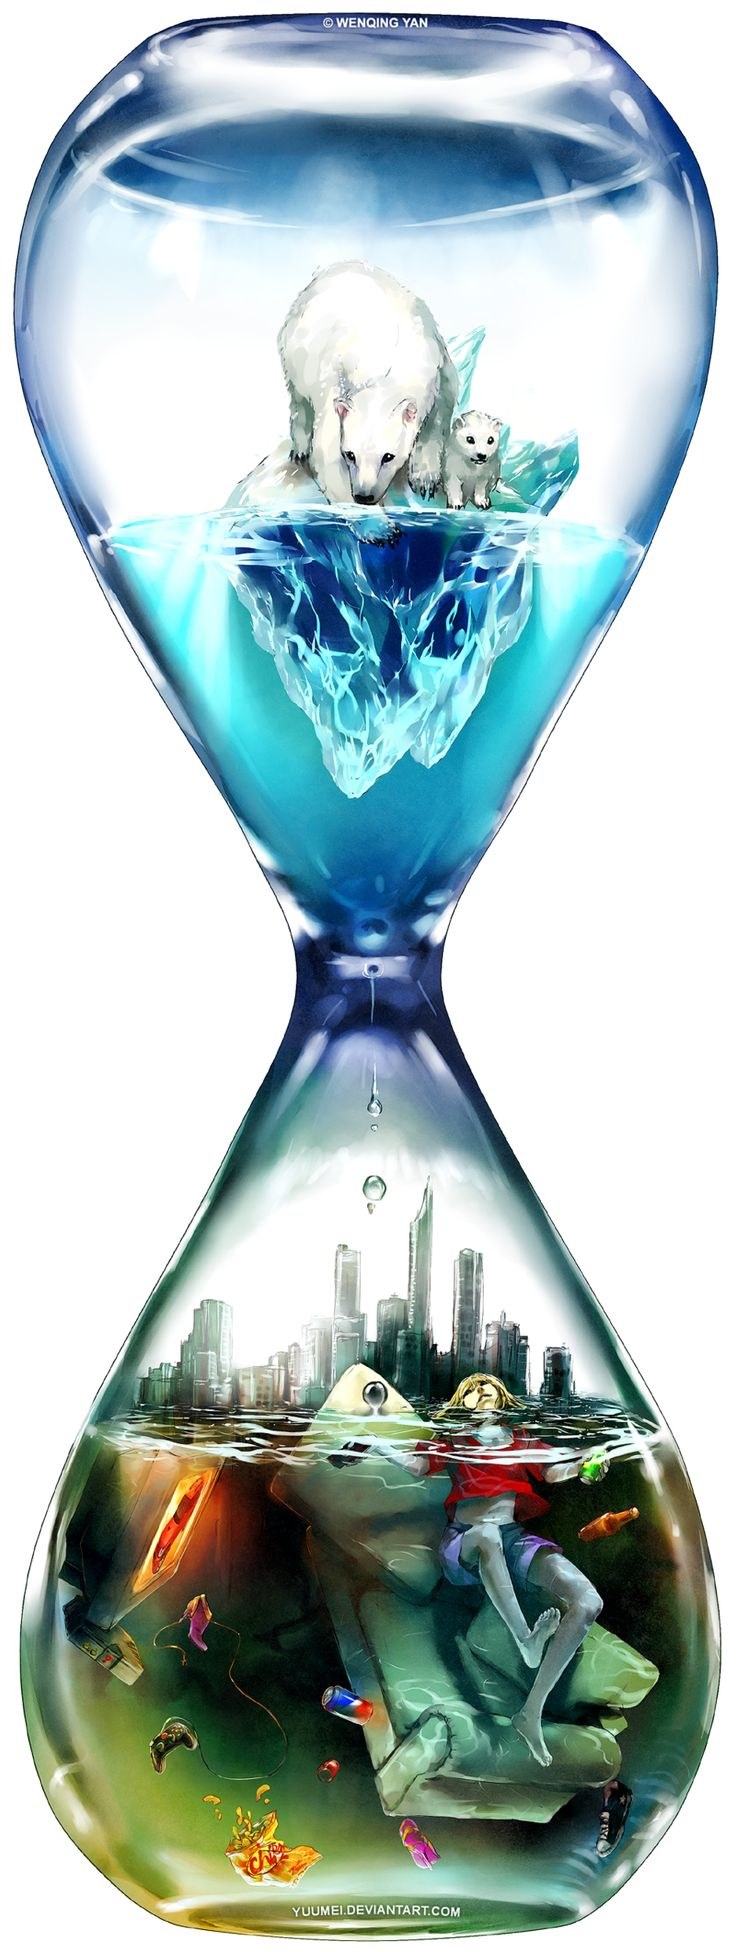 Countdown by yuumei.deviantart.com on @DeviantArt